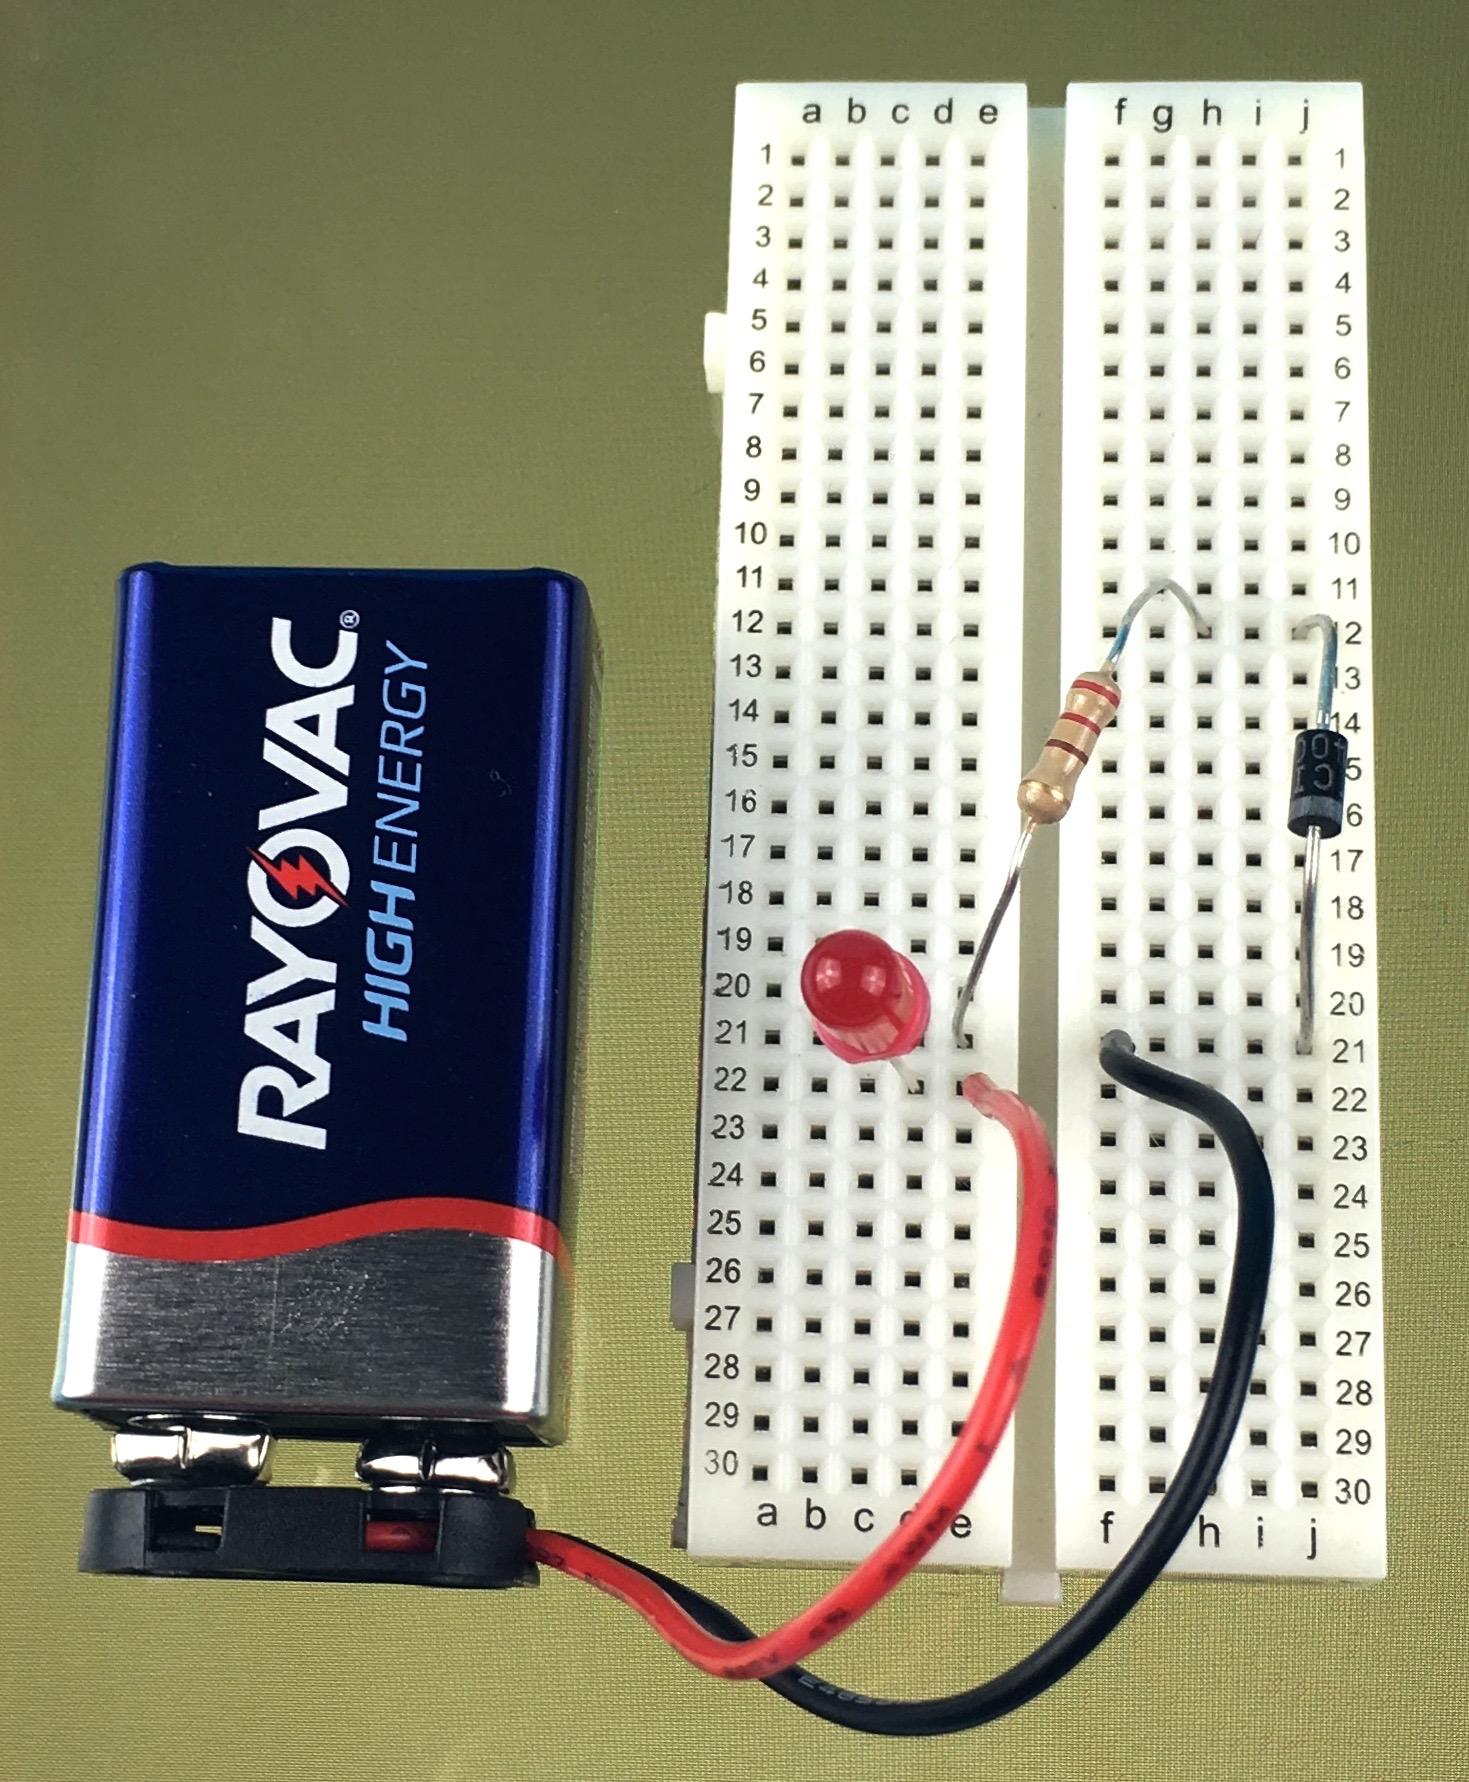 The Basics Lab 9 - Intro to speakers